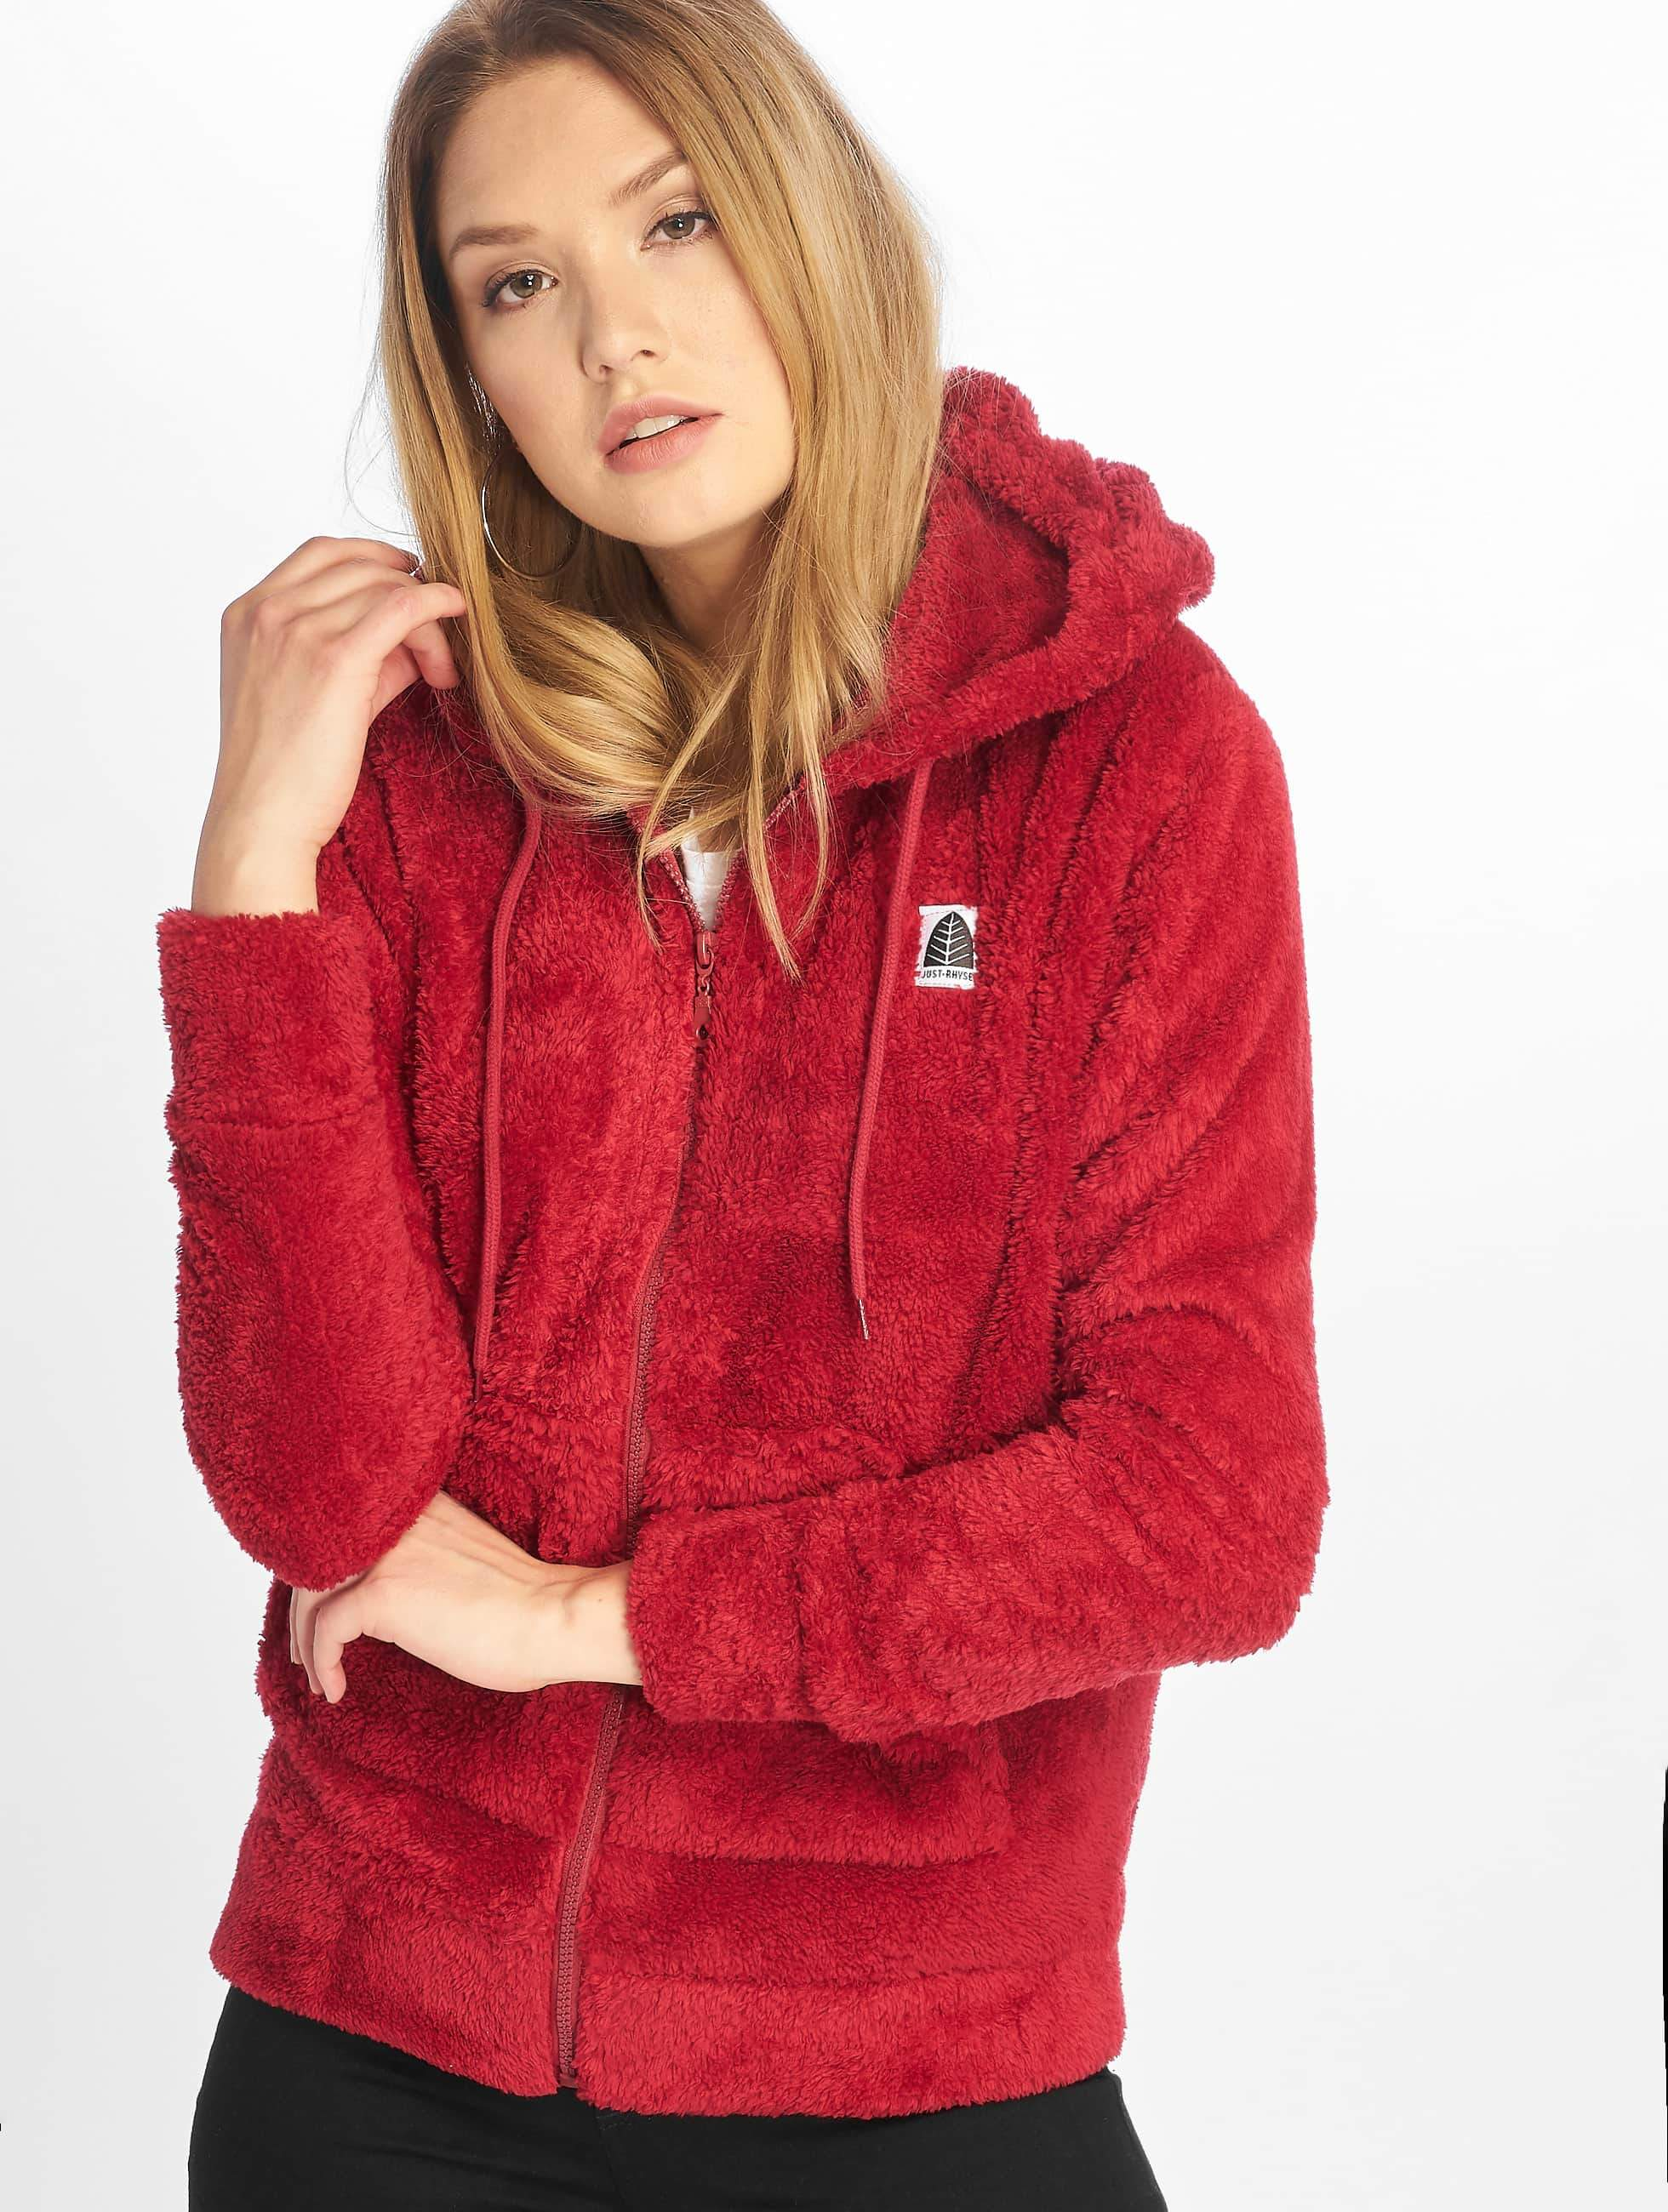 Just Rhyse / Zip Hoodie Arequipa in red L